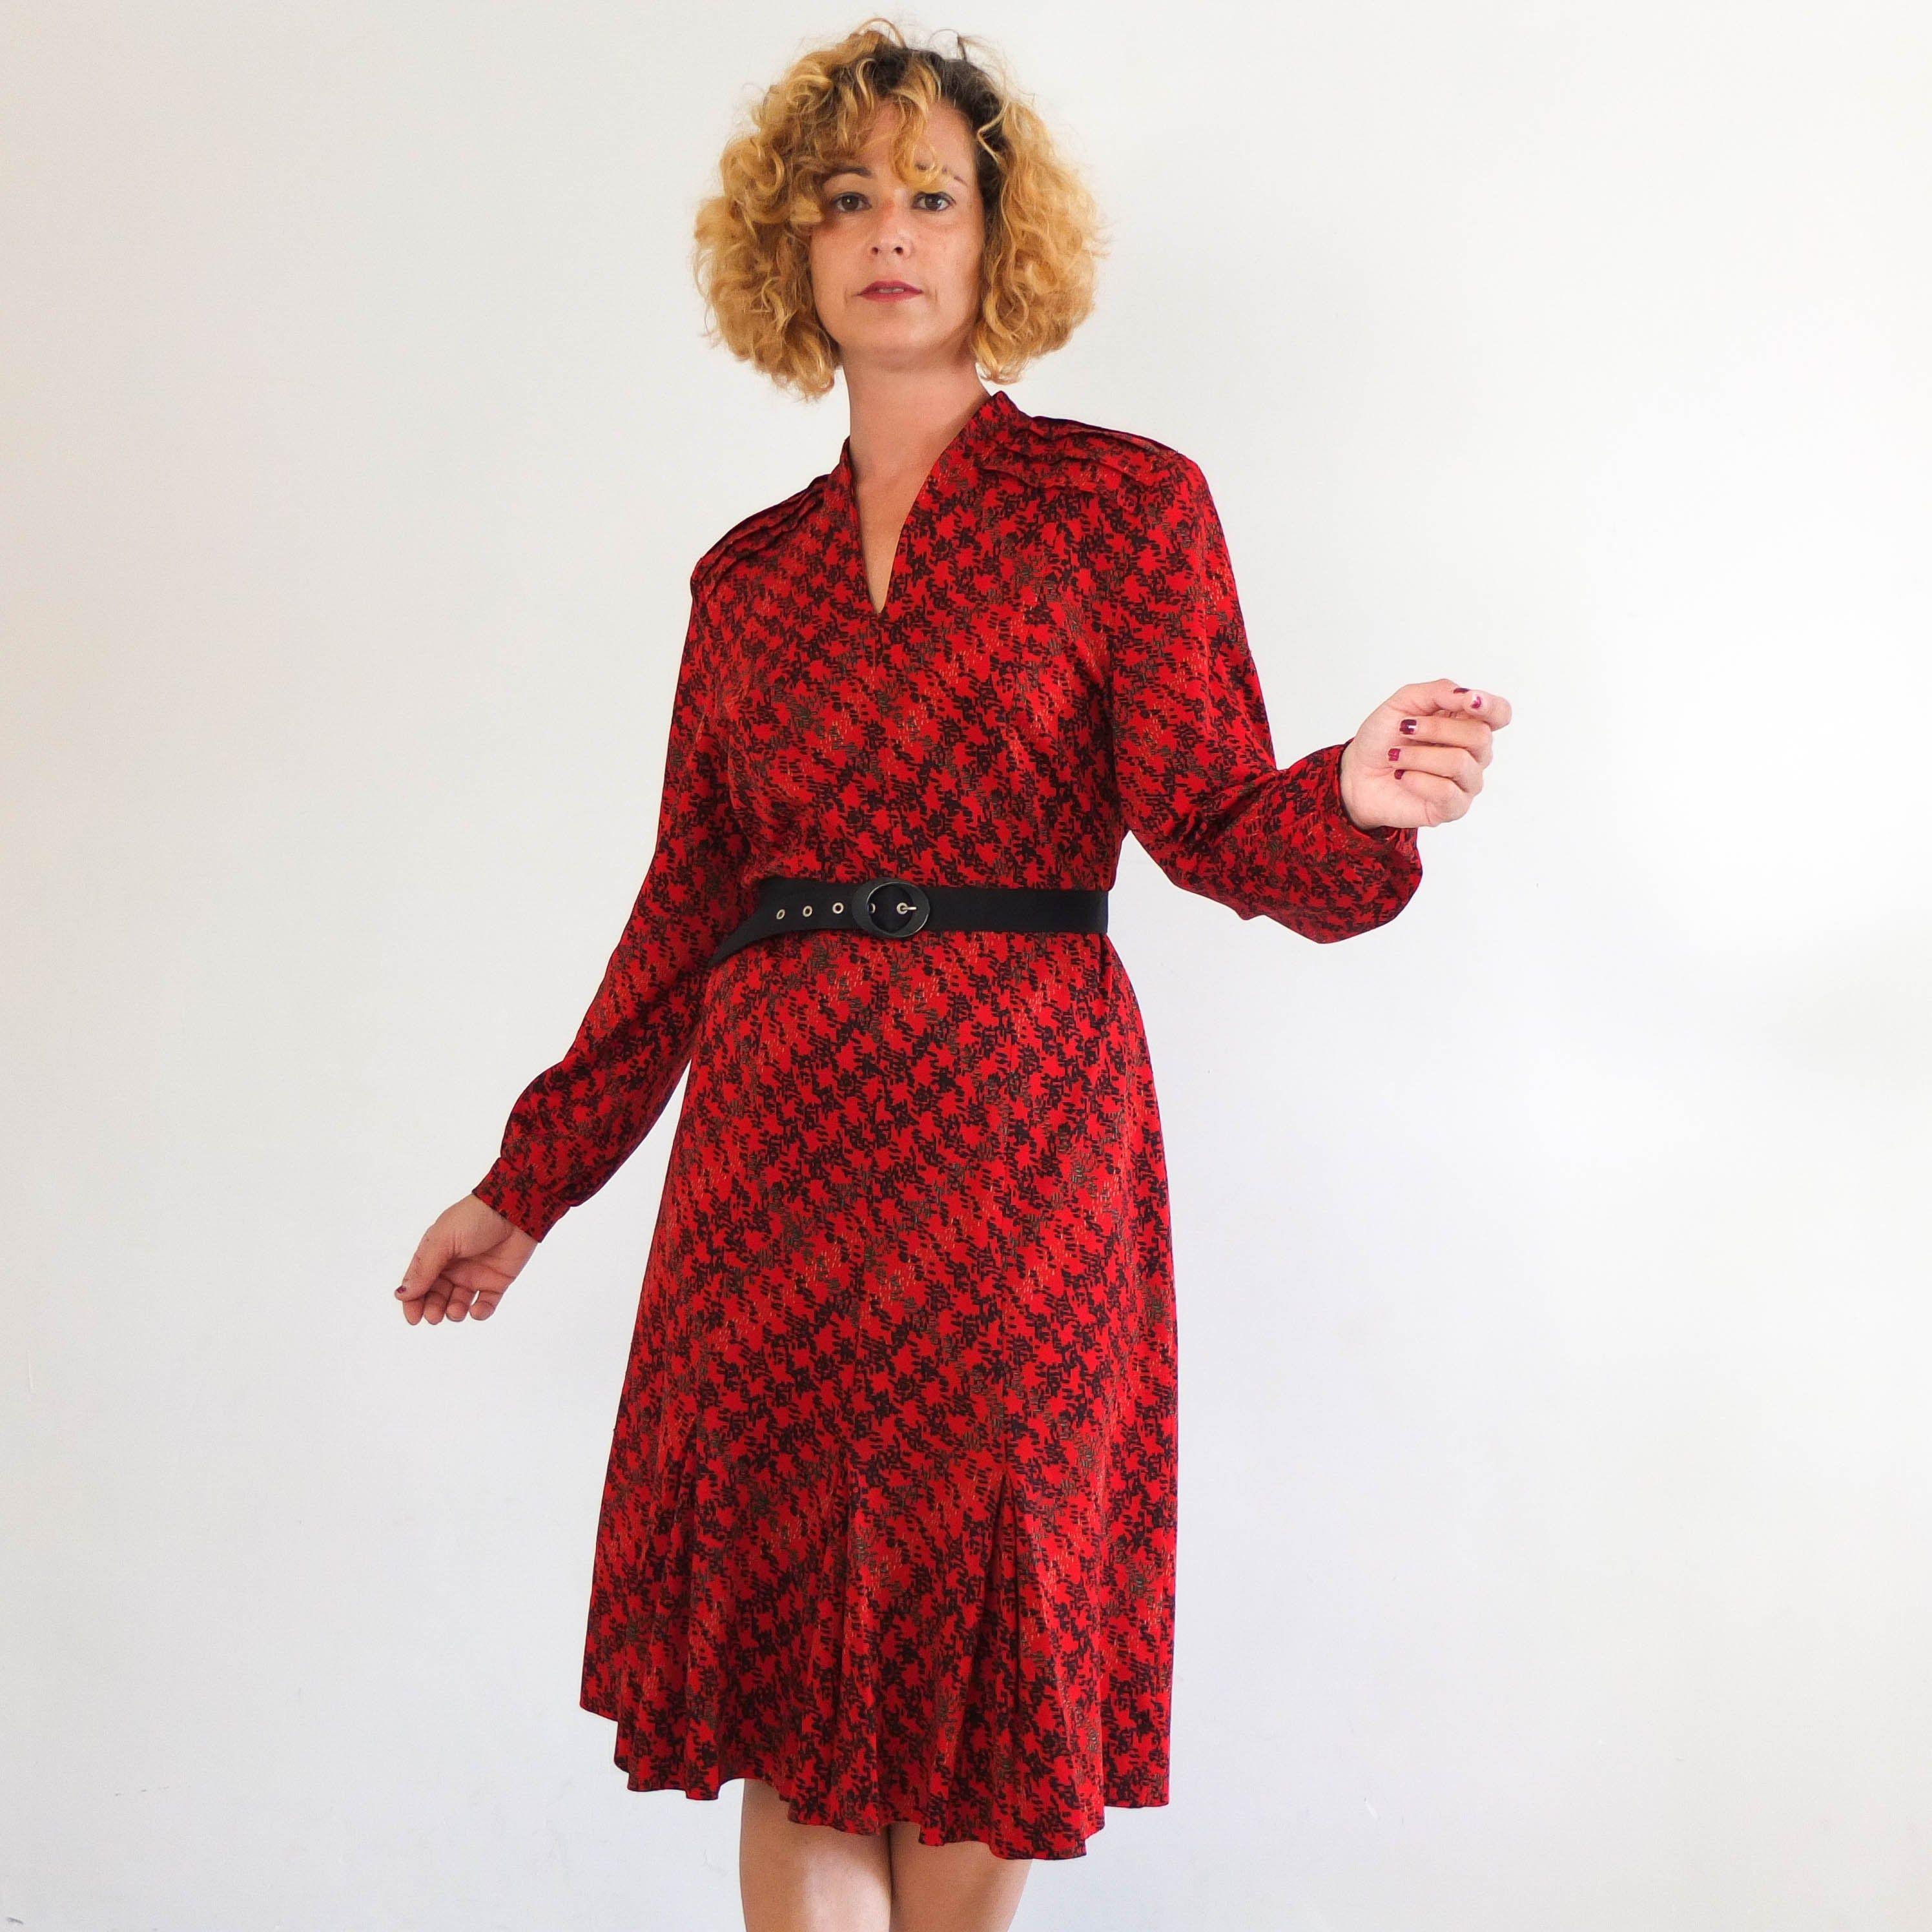 Vintage 70s Retro Midi Dress Plus Size 80s 70s Long Sleeve Mod Shift Dress 70s Casual Day Dress Vintag 70s Retro Dress Retro Midi Dress Patterned Midi Dress [ 2992 x 2992 Pixel ]